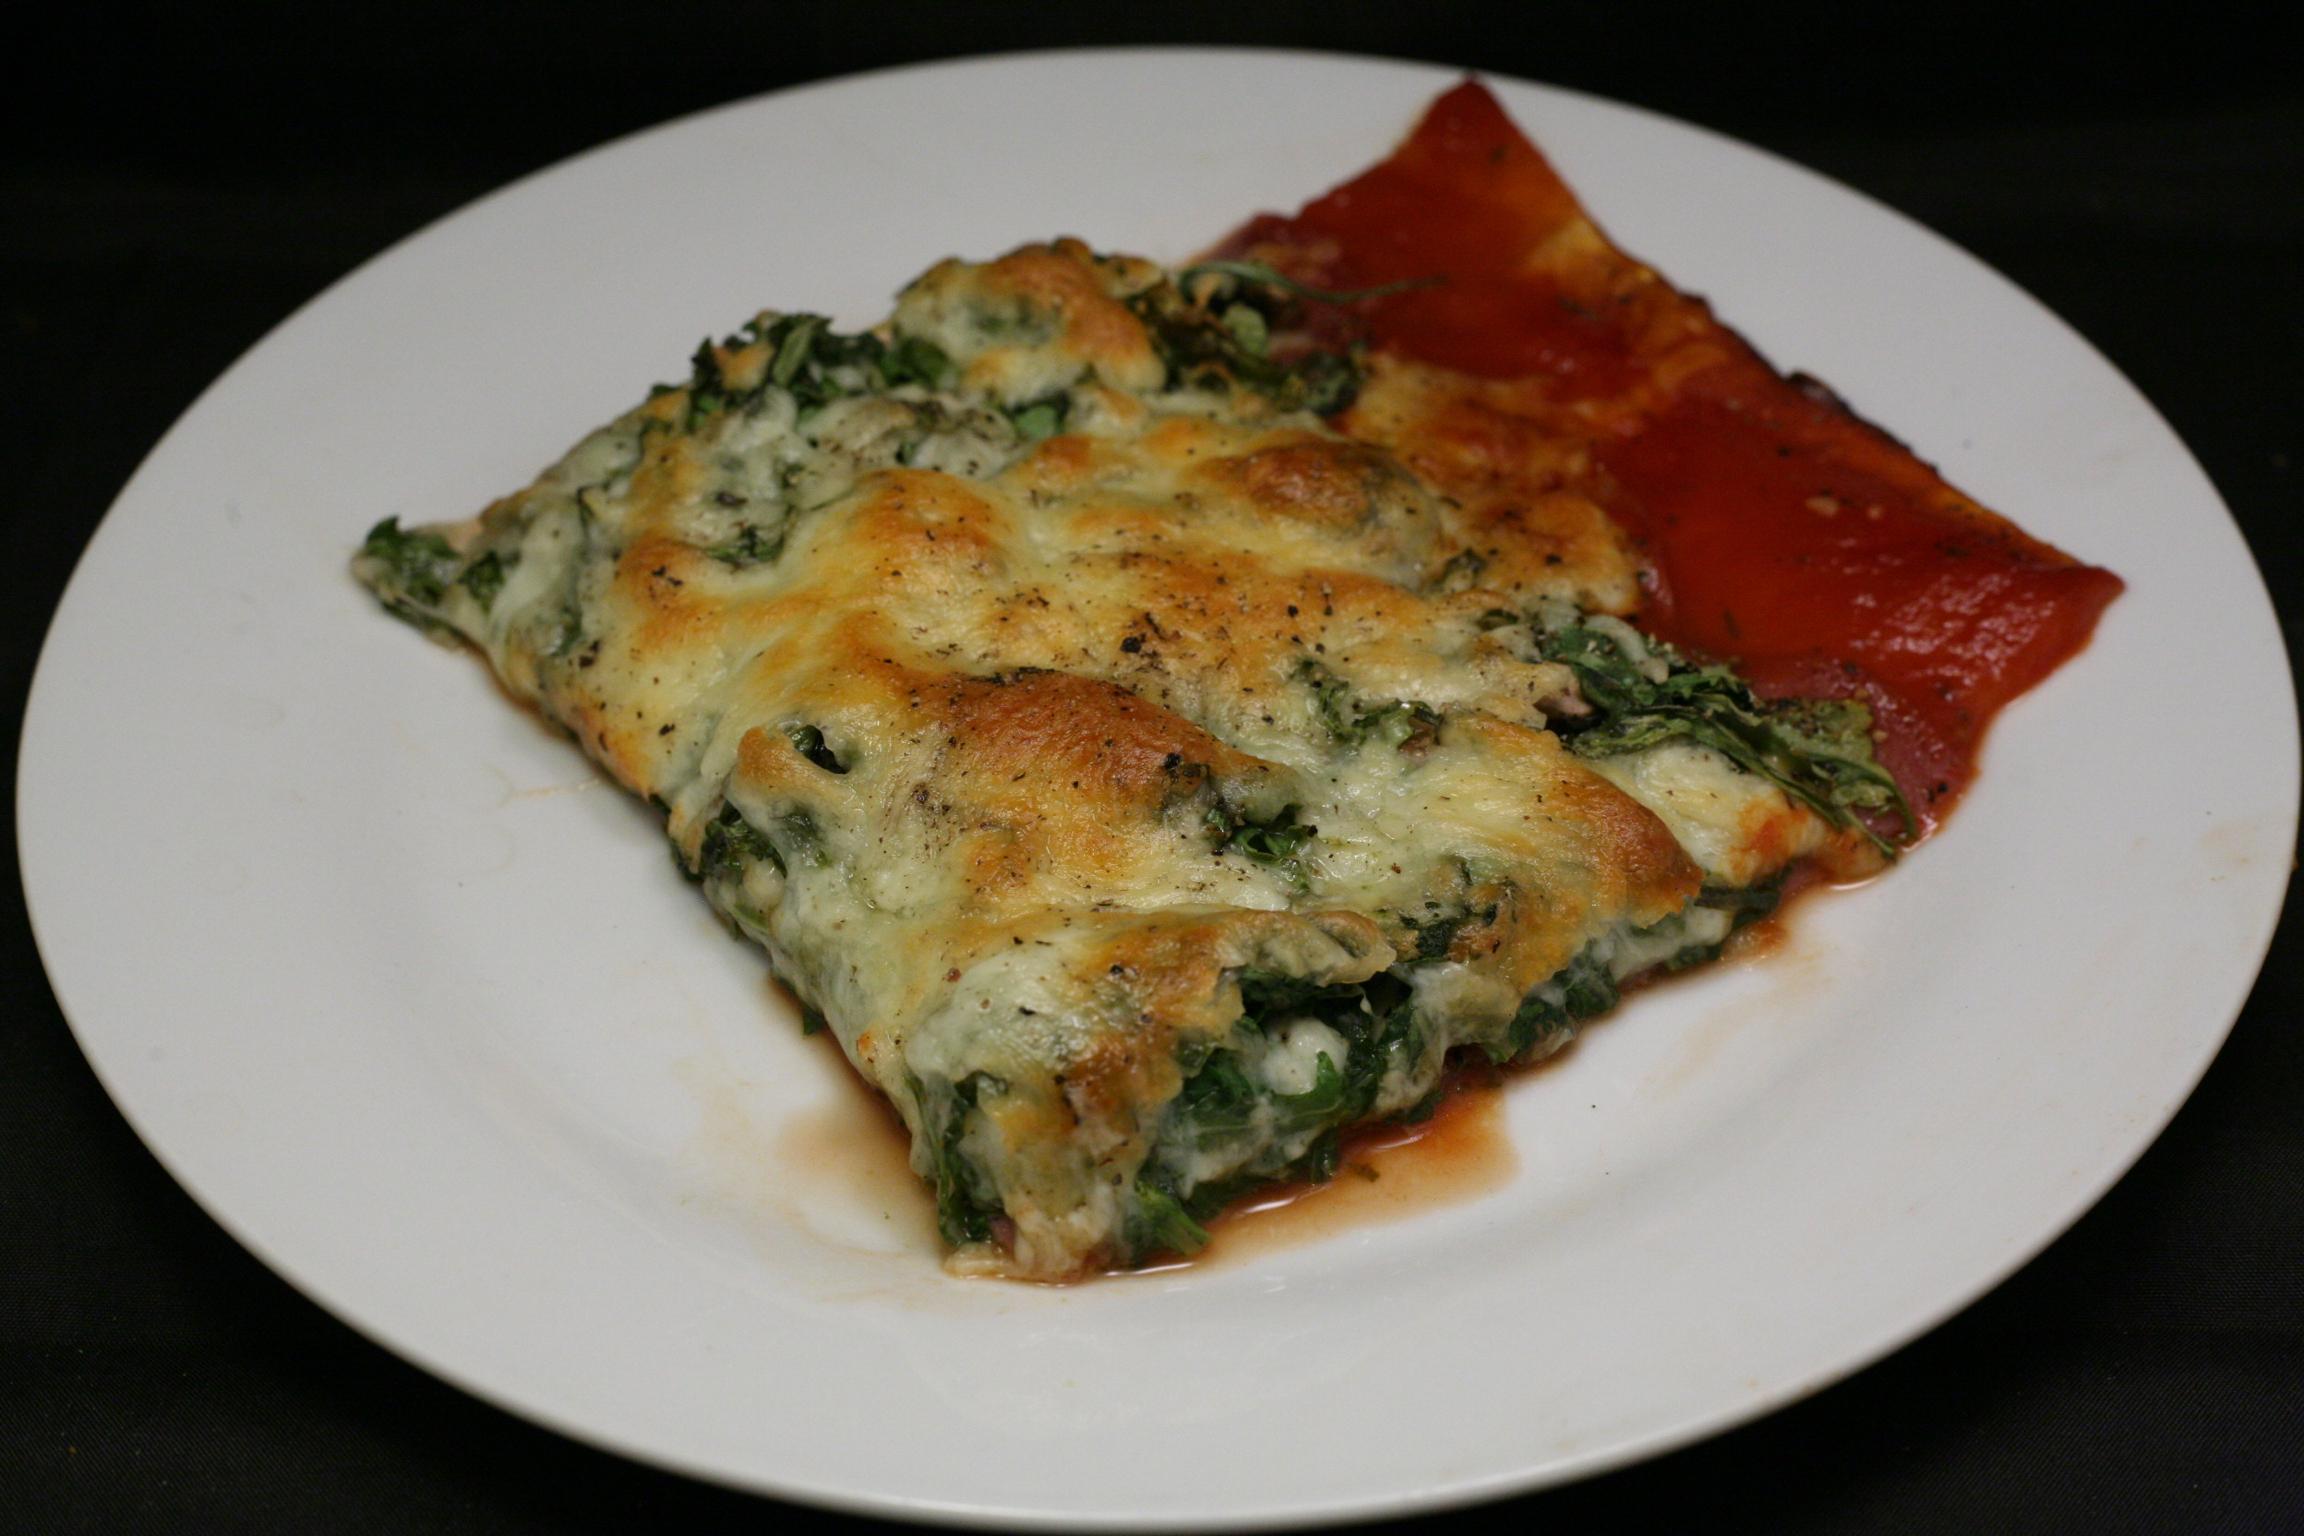 Pizza mit Rucola, Salami, Champignons und Oliven